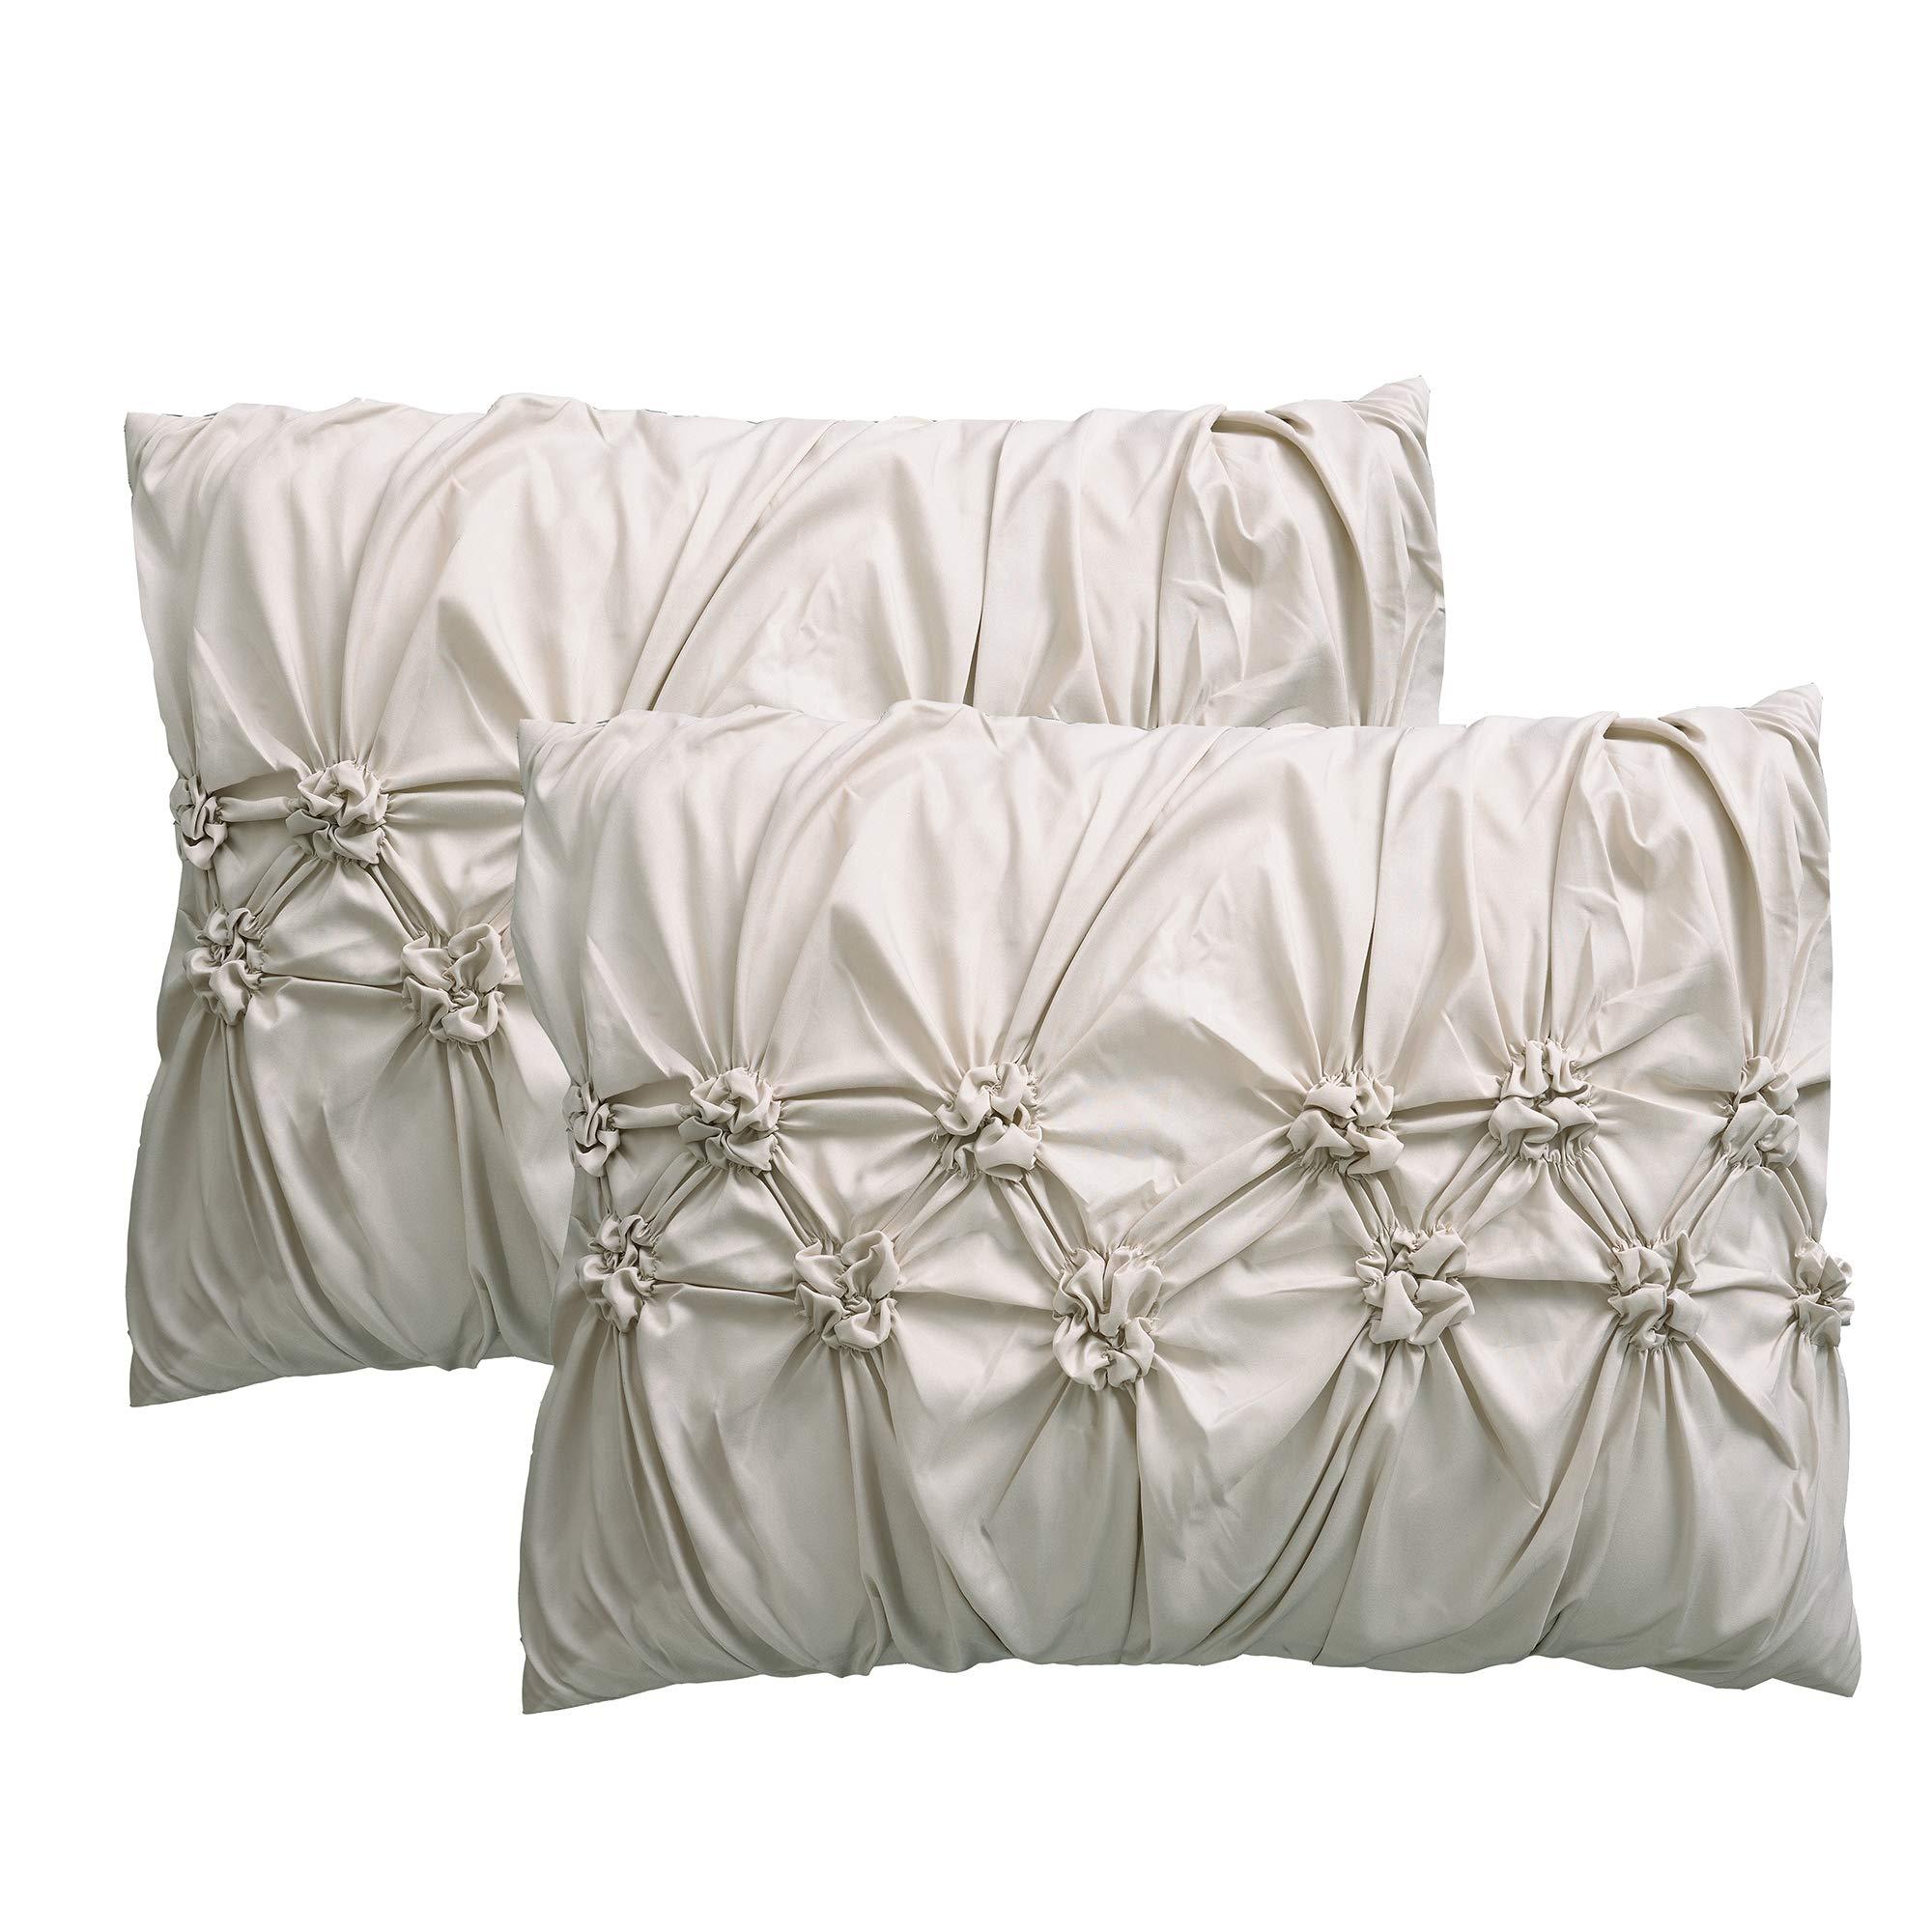 Amrapur Overseas 8-Piece Sophie Comforter Set, King/California King, Sand by Amrapur Overseas (Image #5)